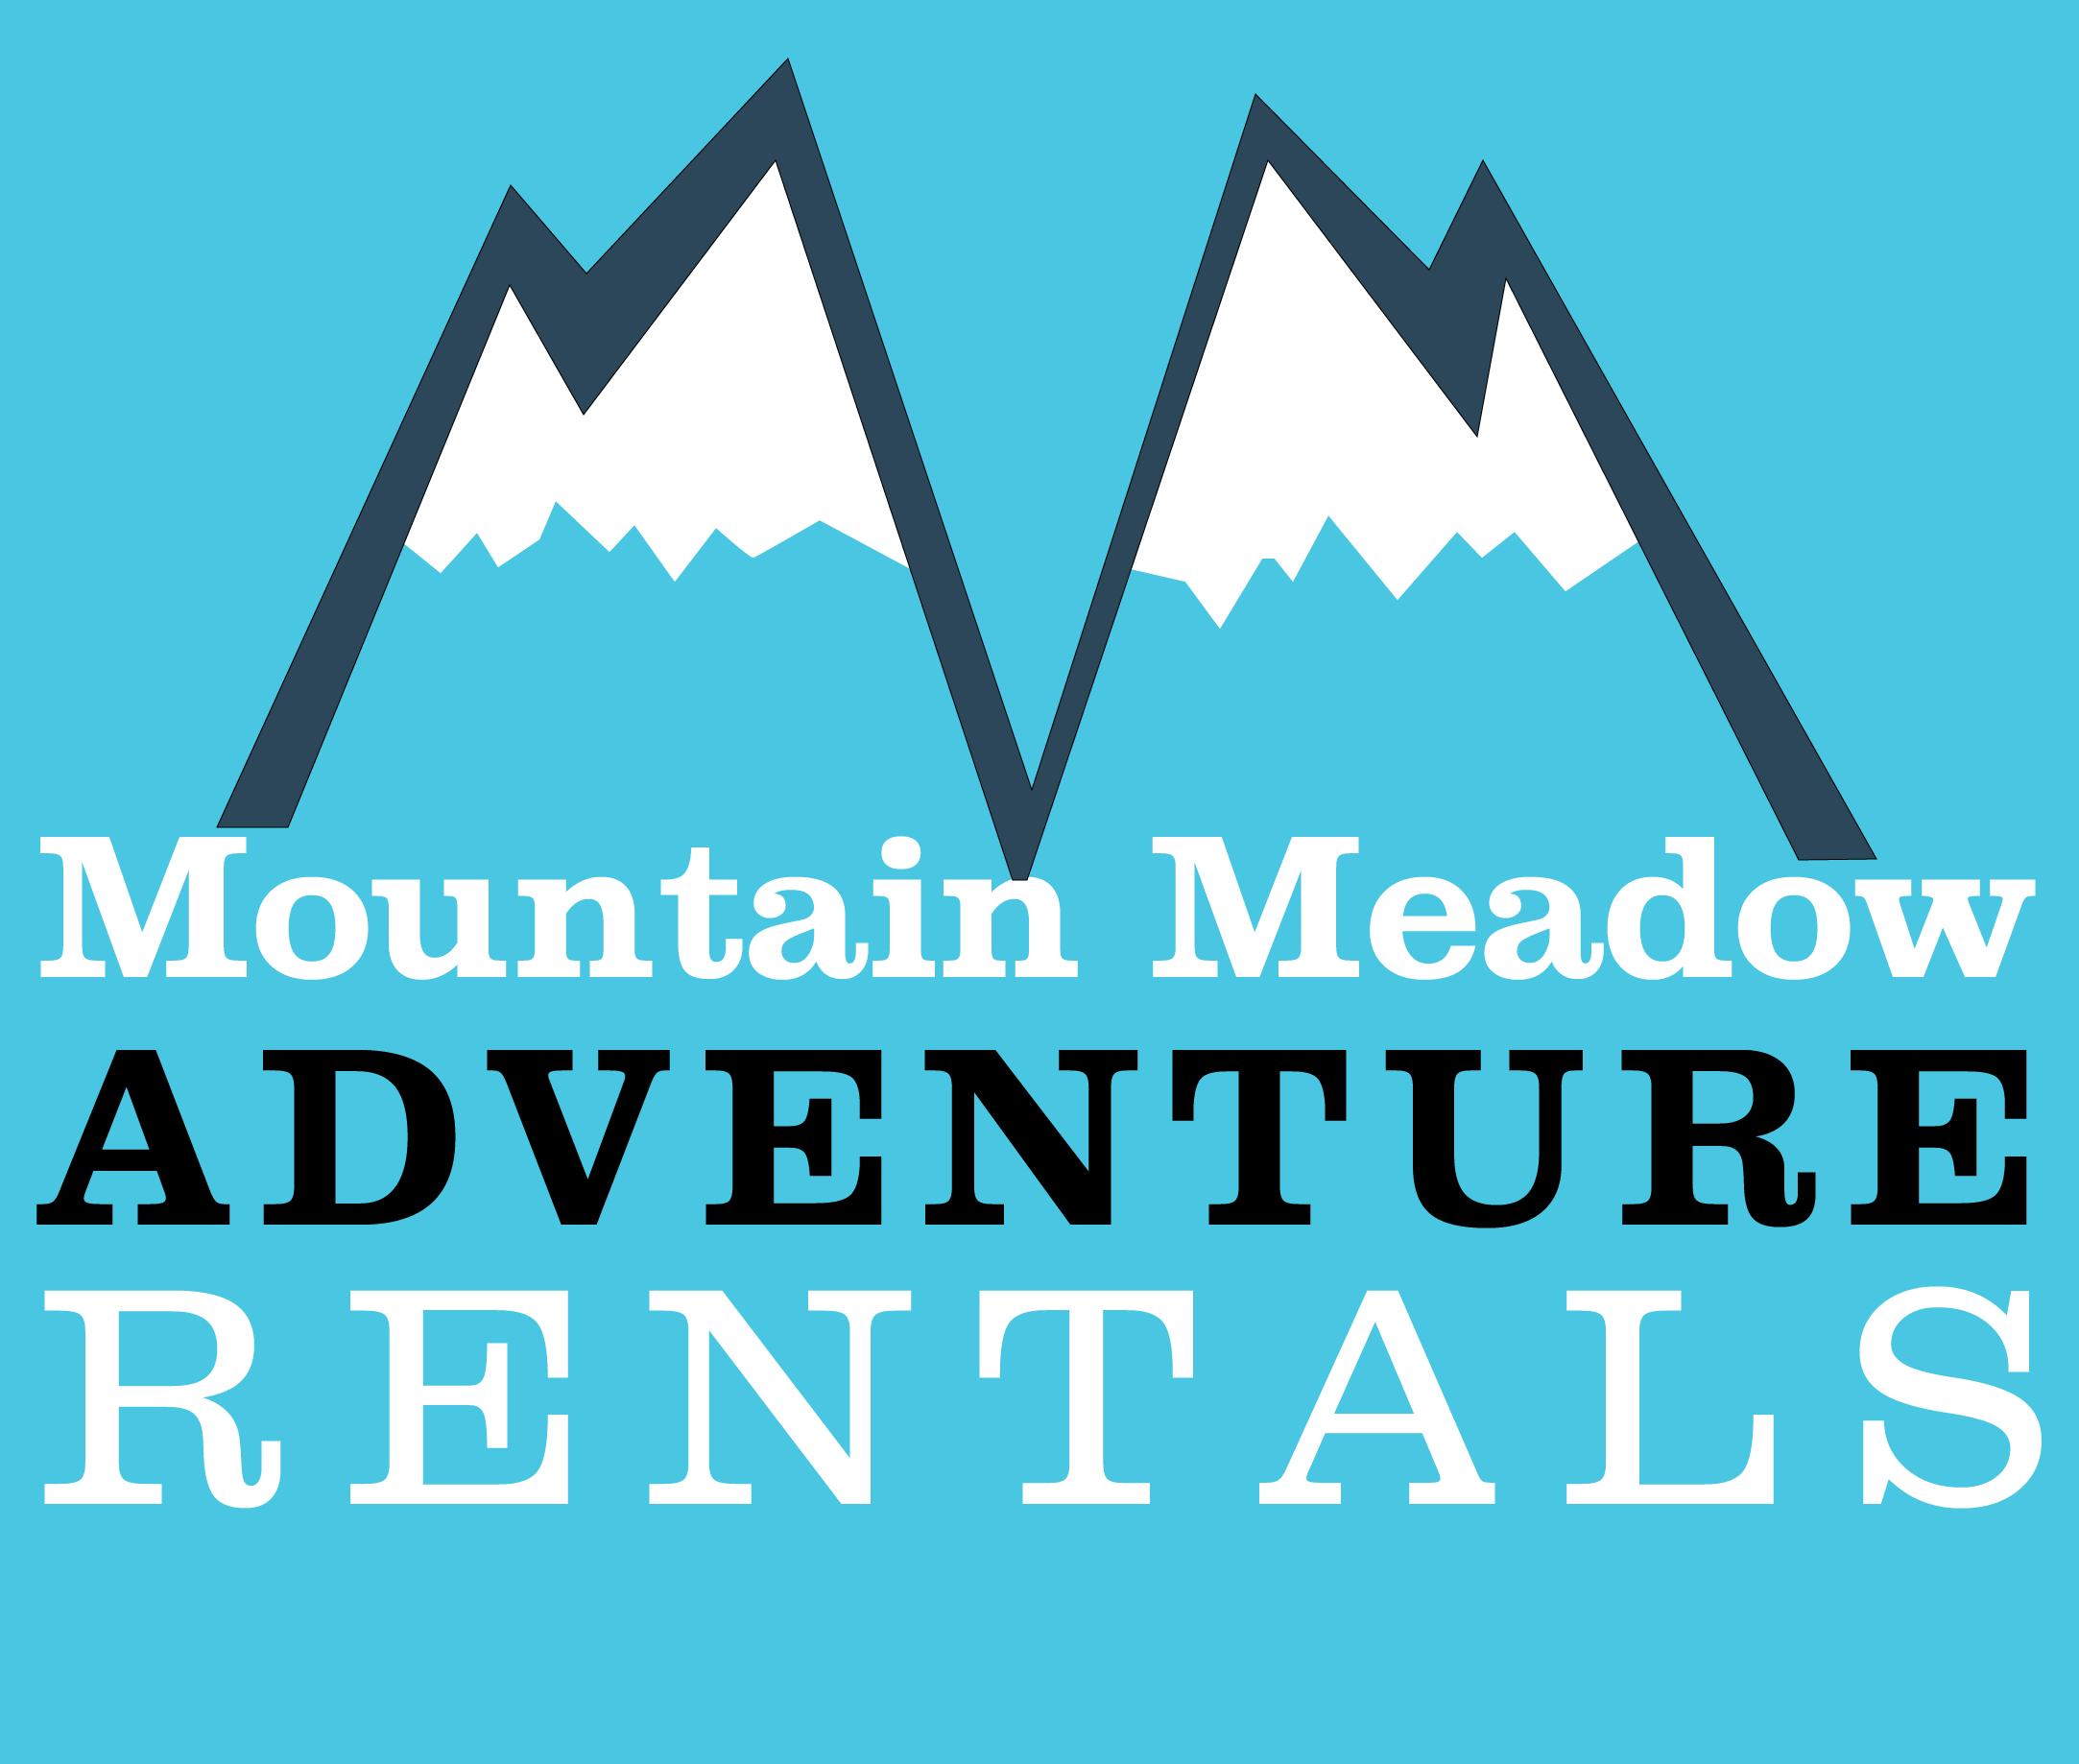 Mountain Meadows Adventure Rentals